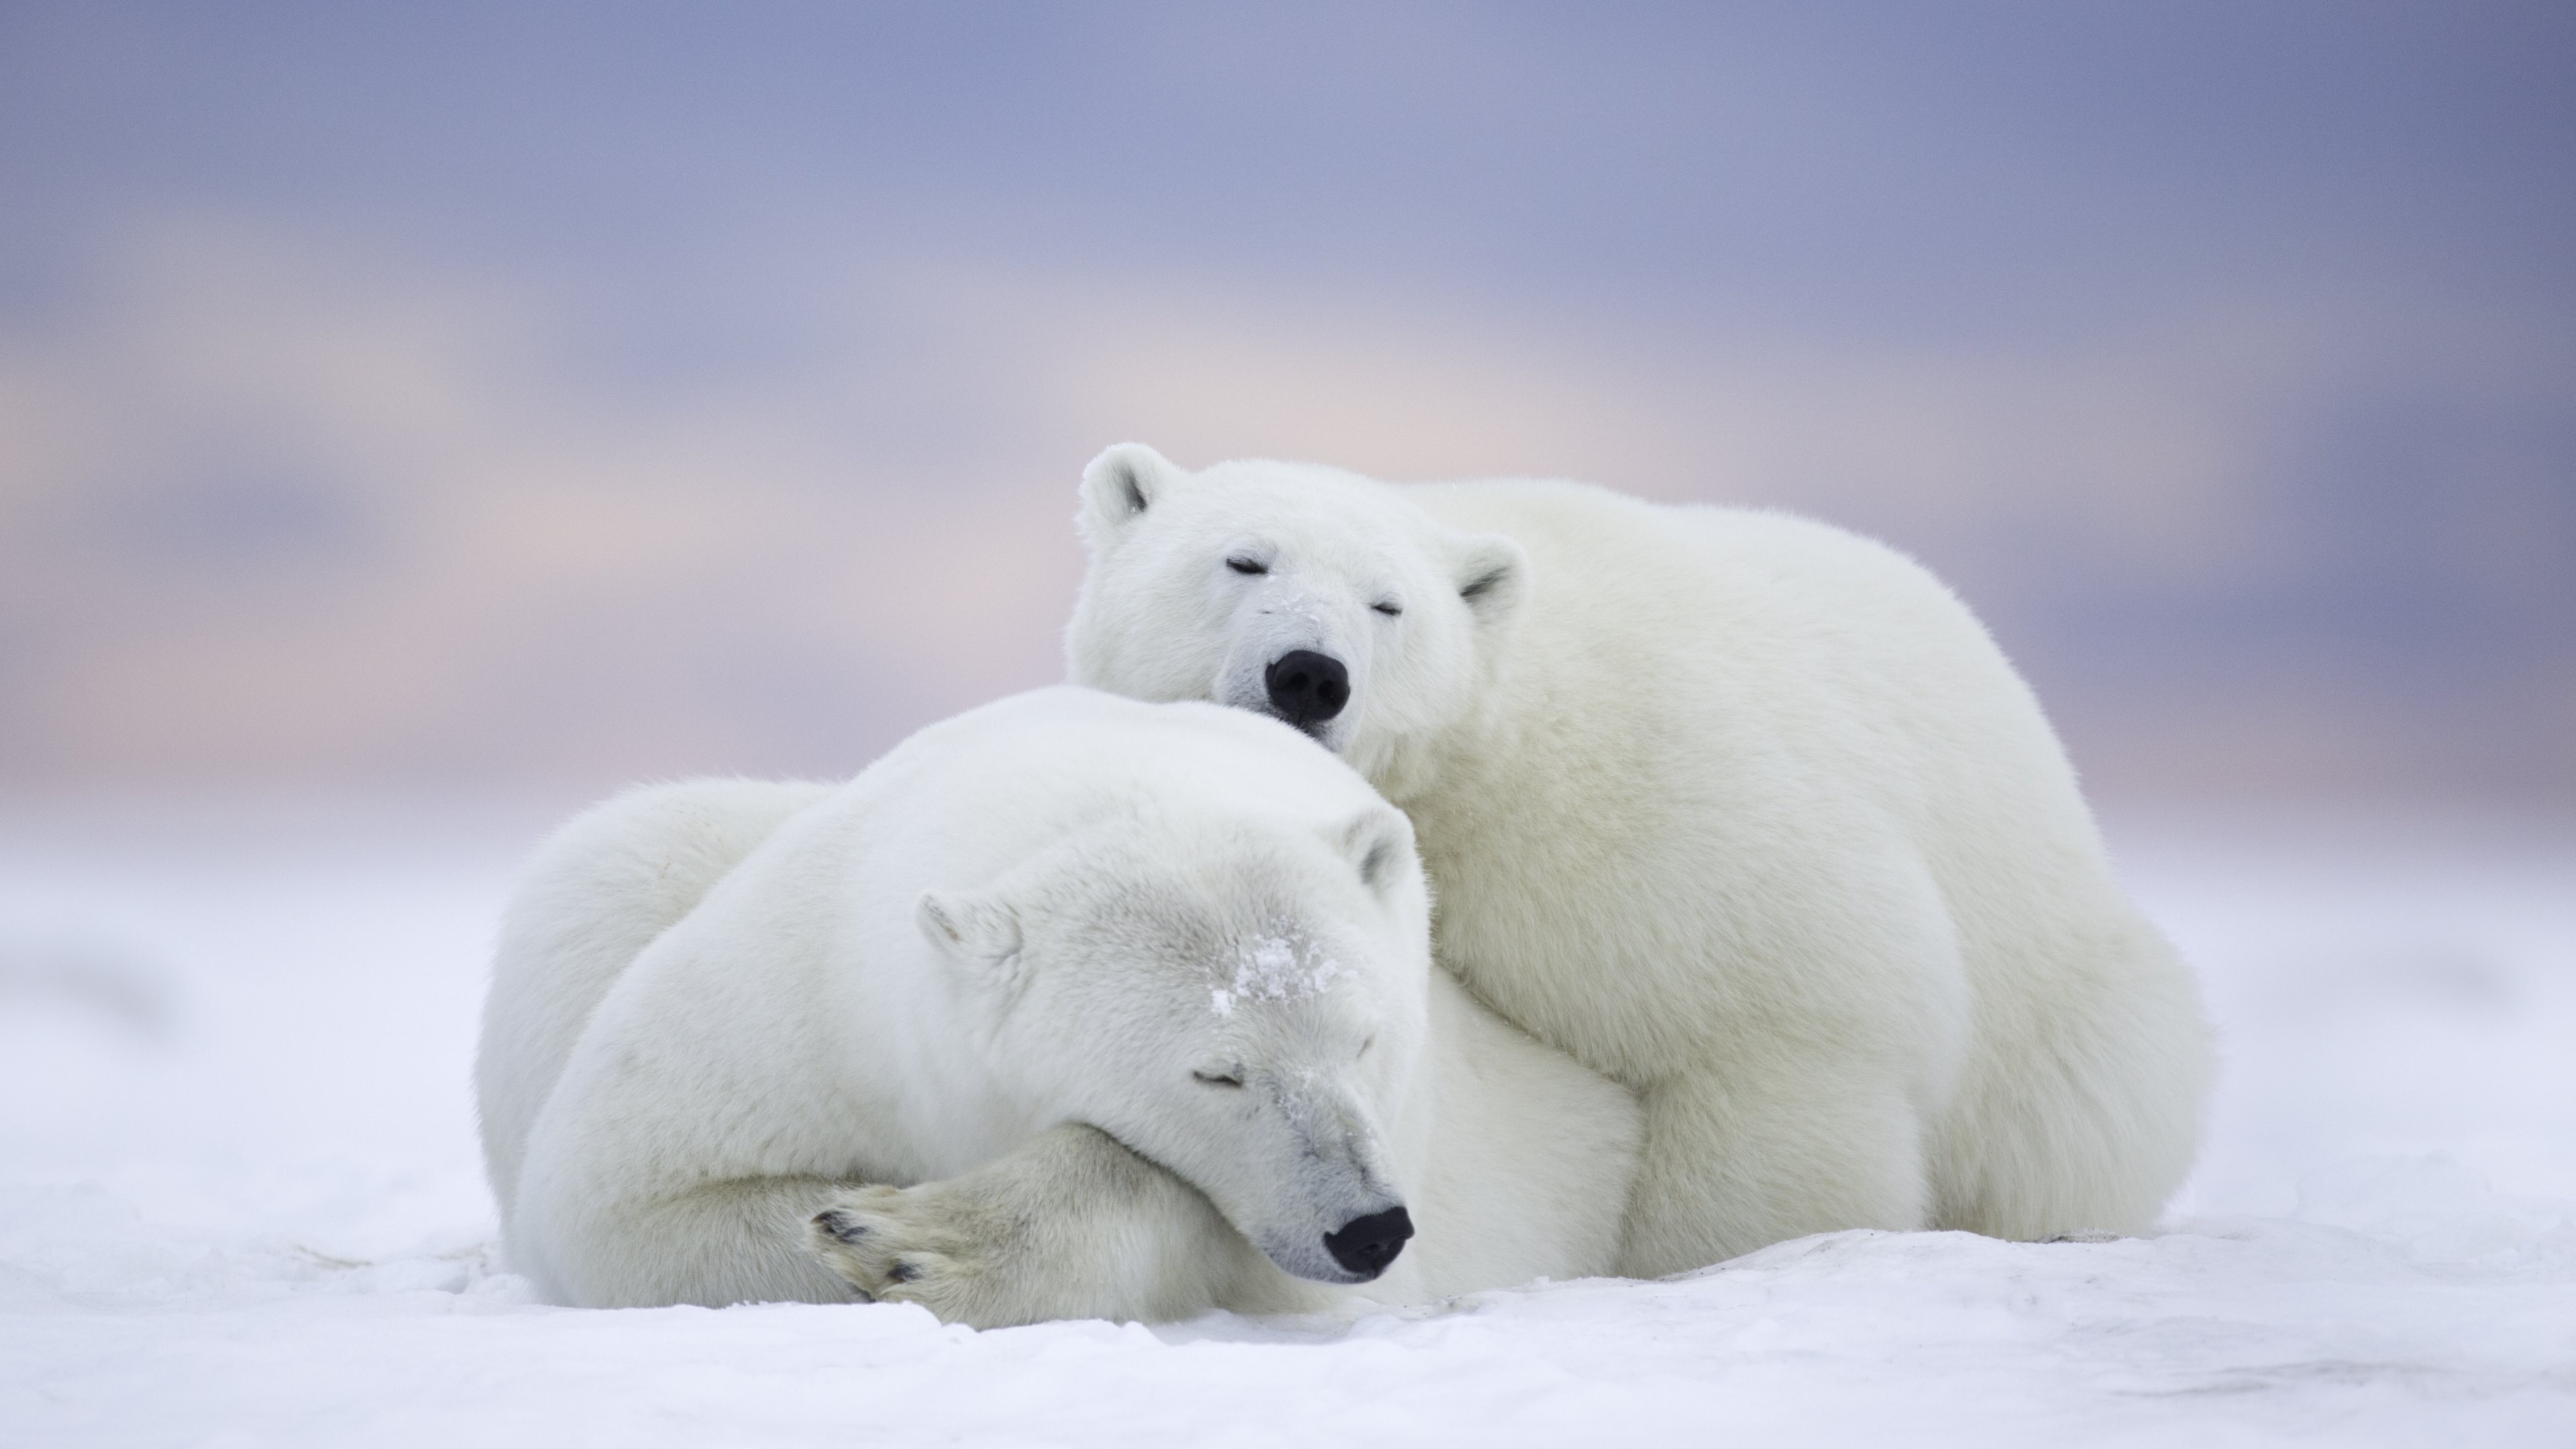 Animals   Wild   Polar Bears   Wallpaper 3840x2160